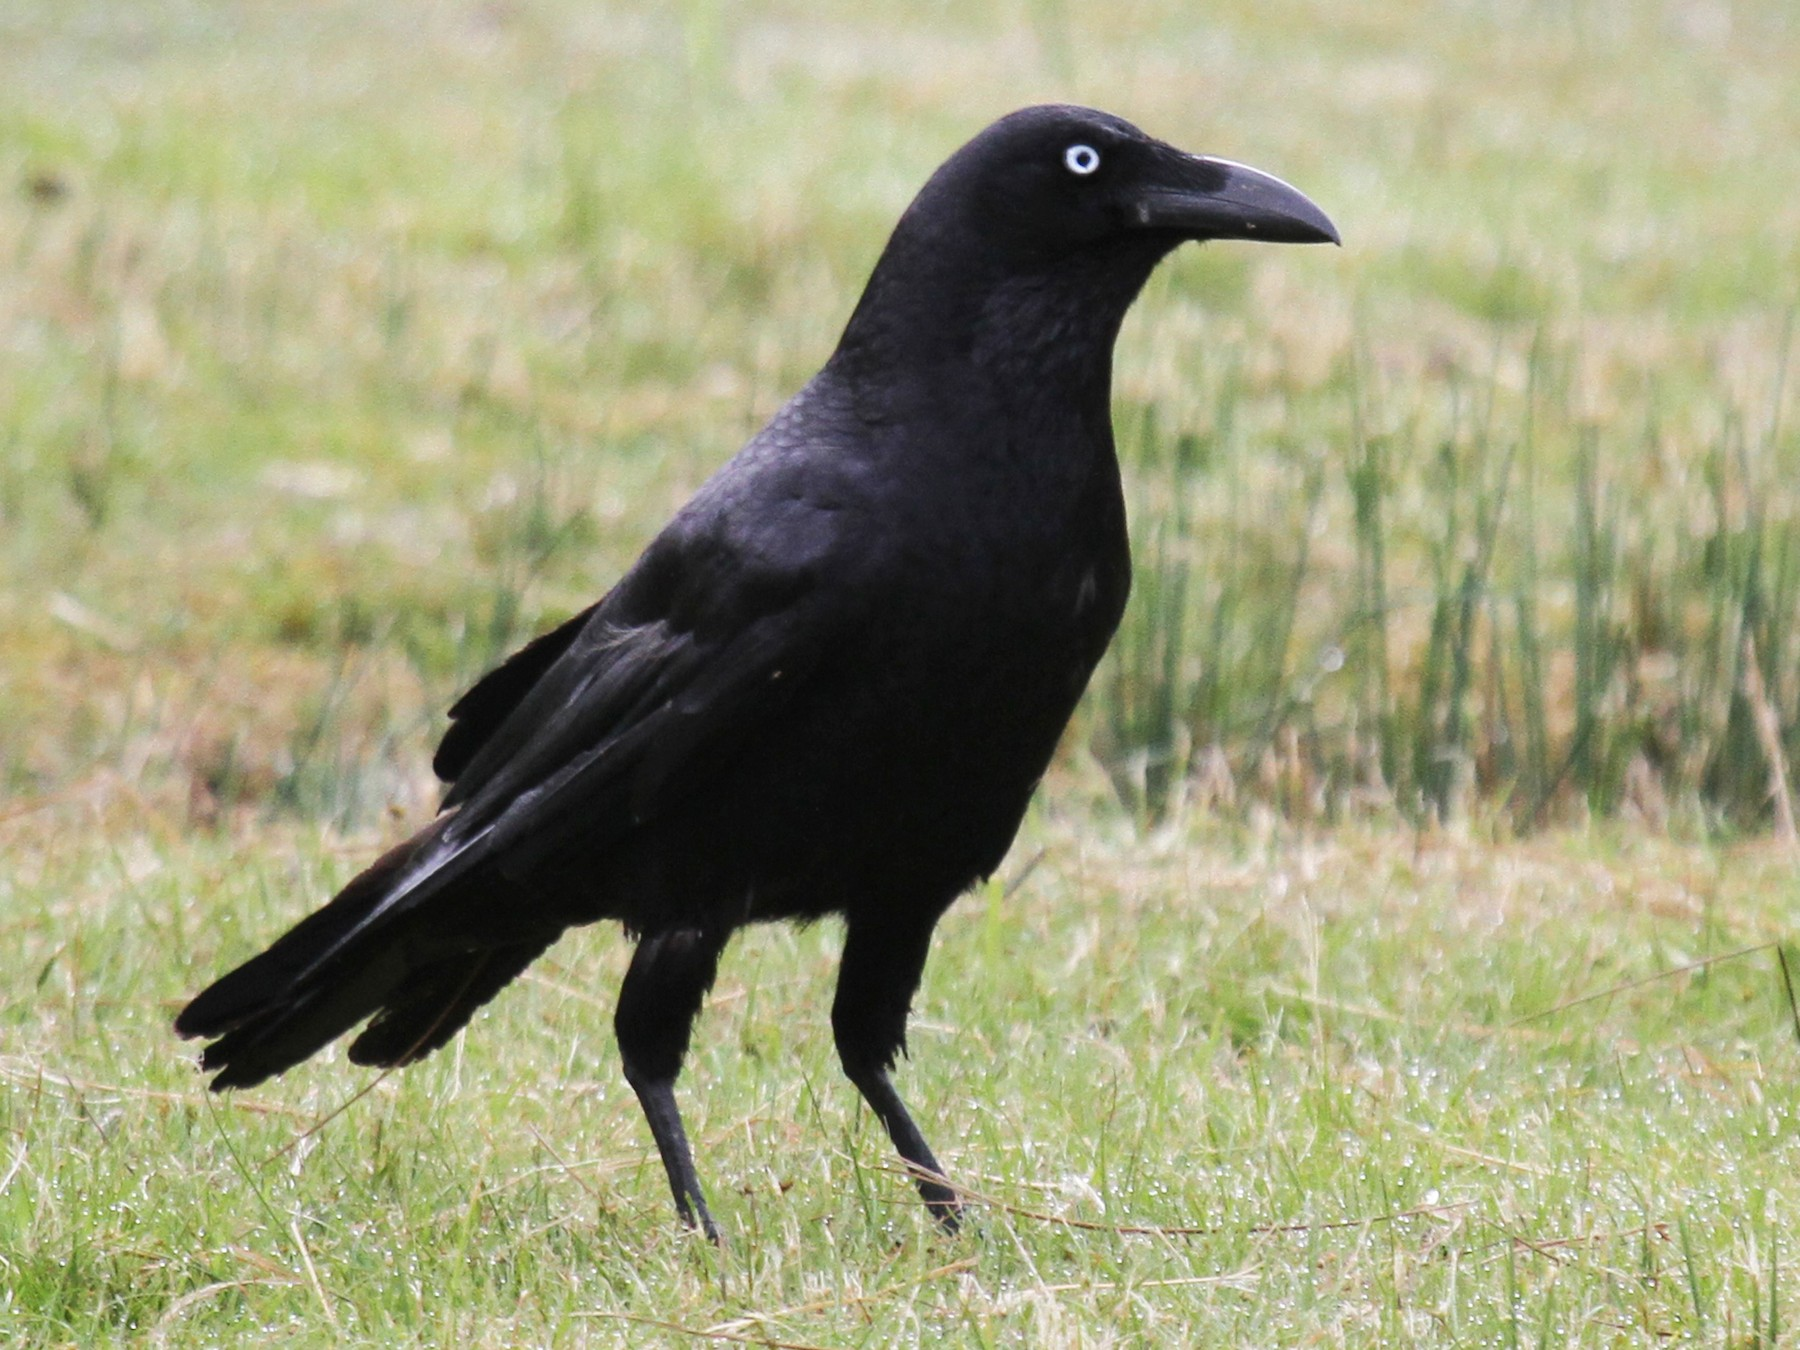 Forest Raven - Margot Oorebeek